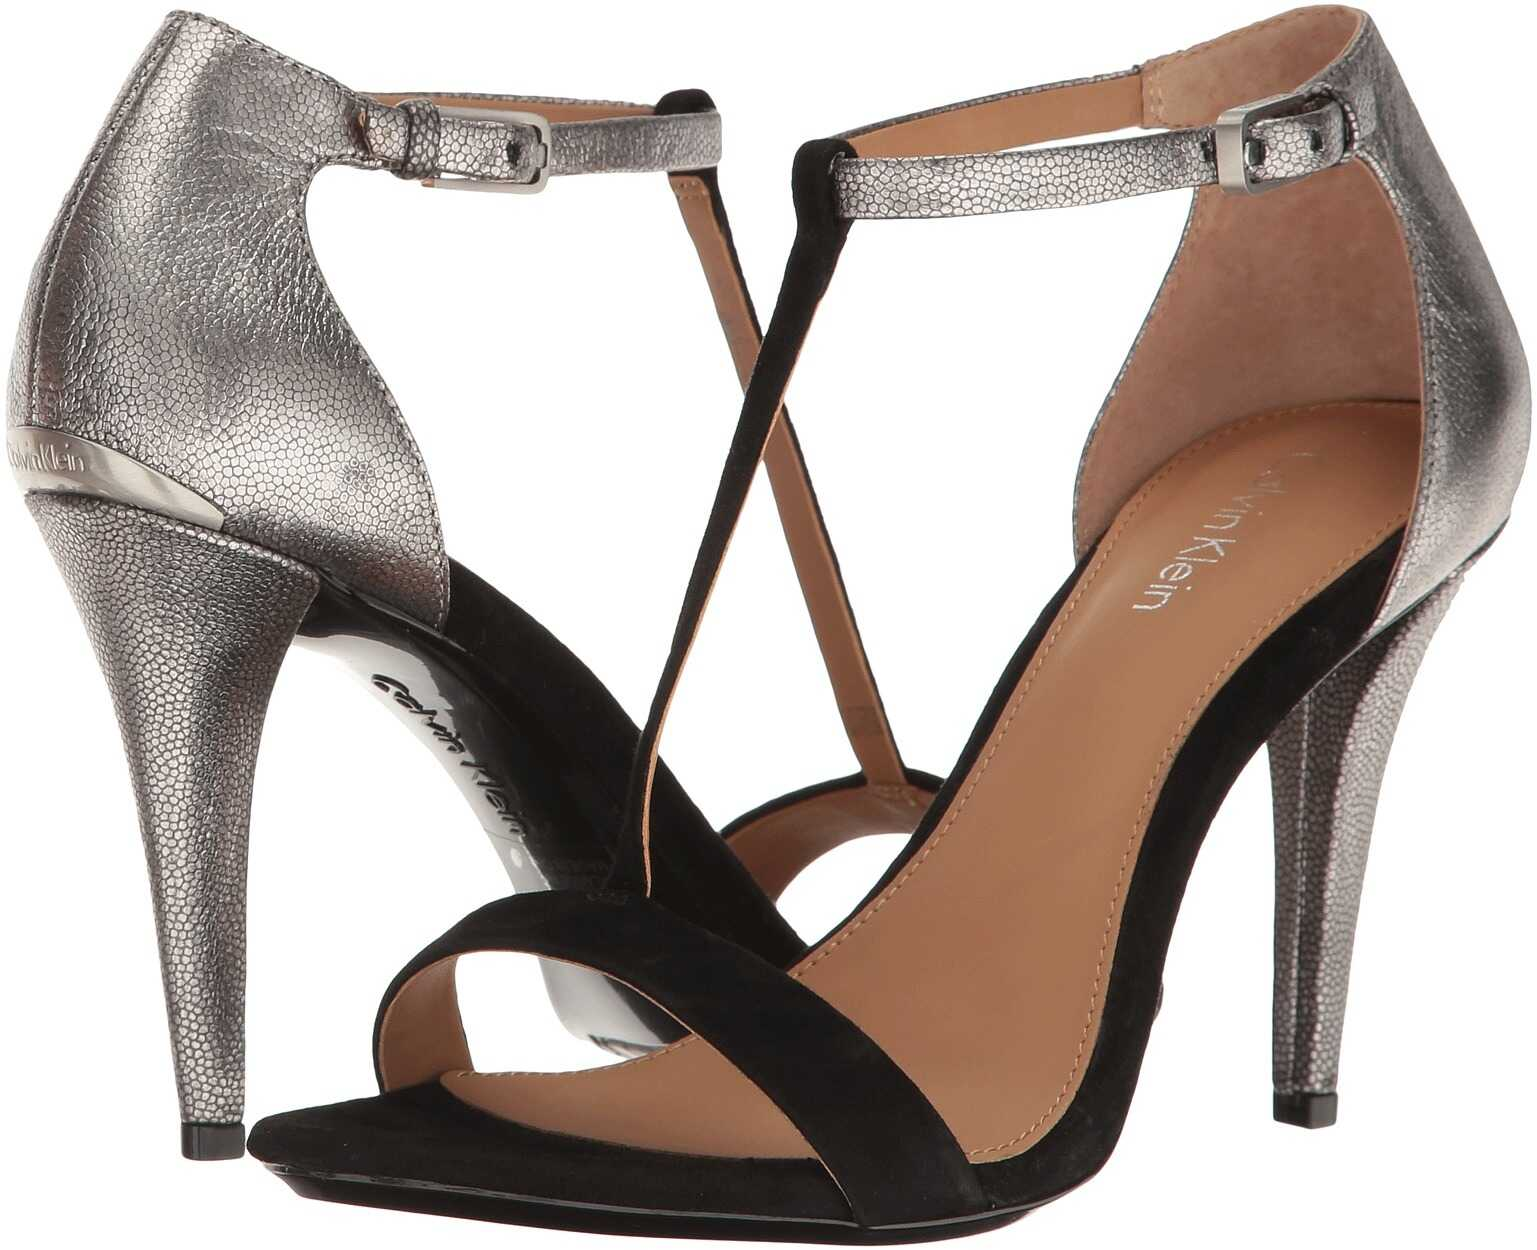 Calvin Klein Nasi Black/Dark Silver Suede/Metallic Stingray Print Leather